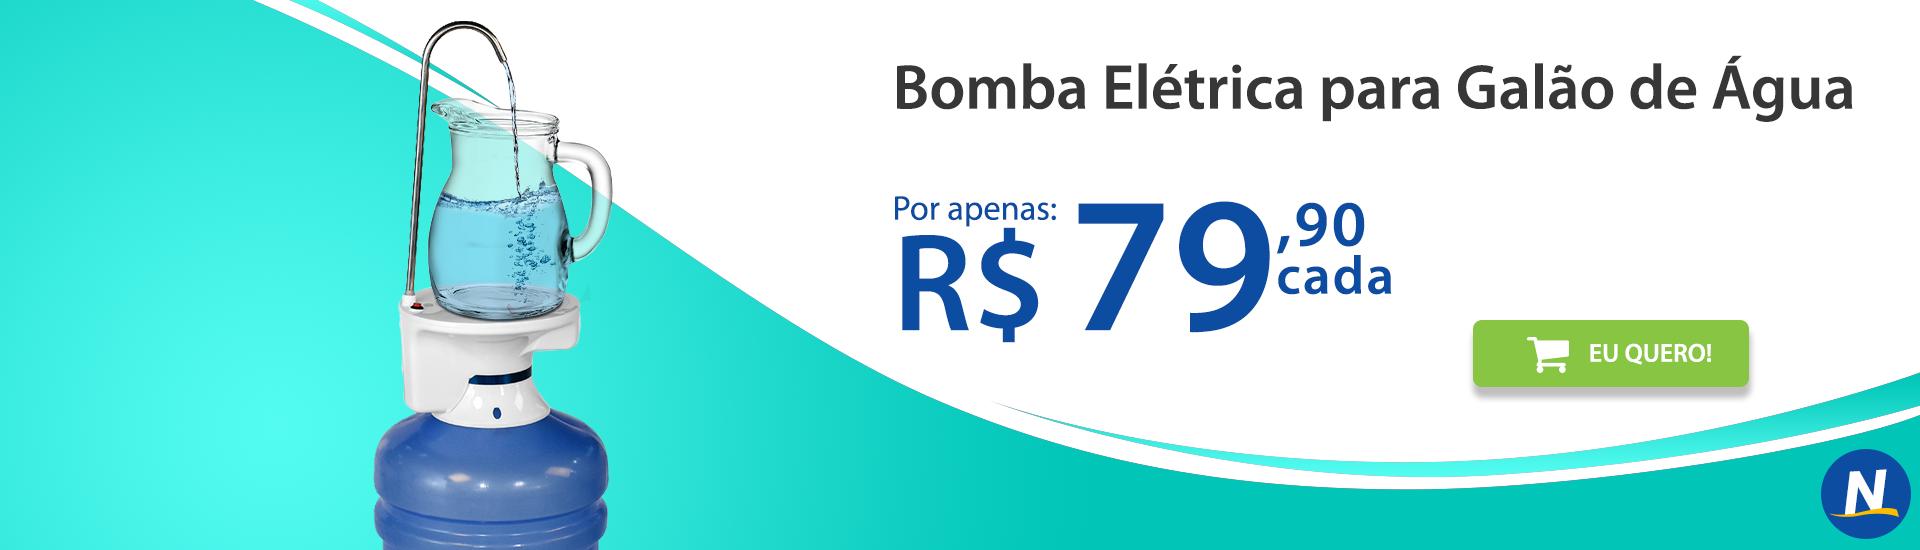 Banner Bomba D'agua